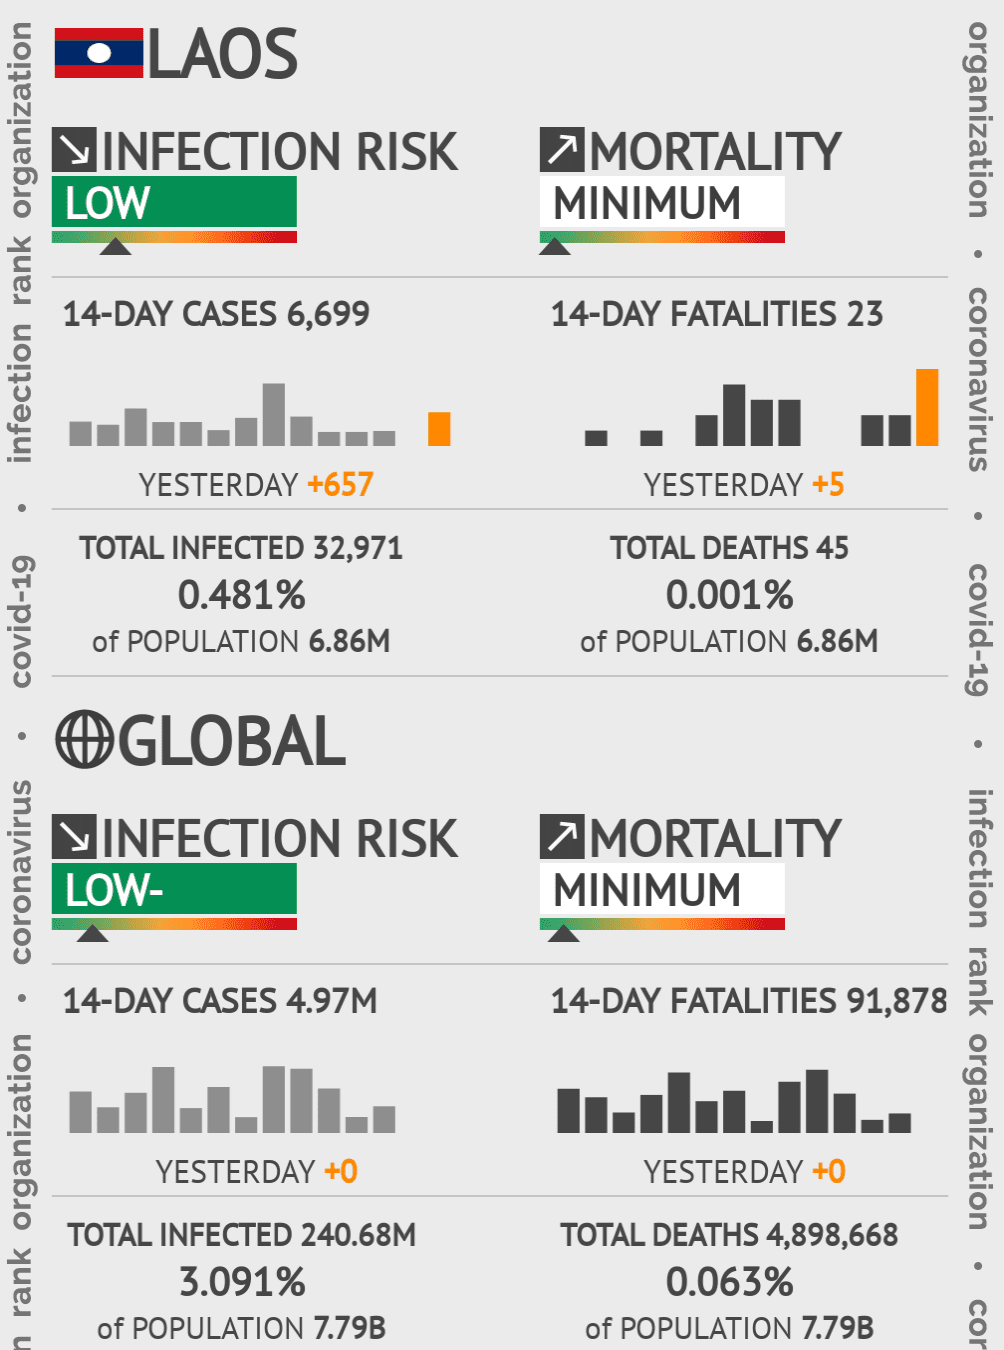 Laos Coronavirus Covid-19 Risk of Infection on March 03, 2021